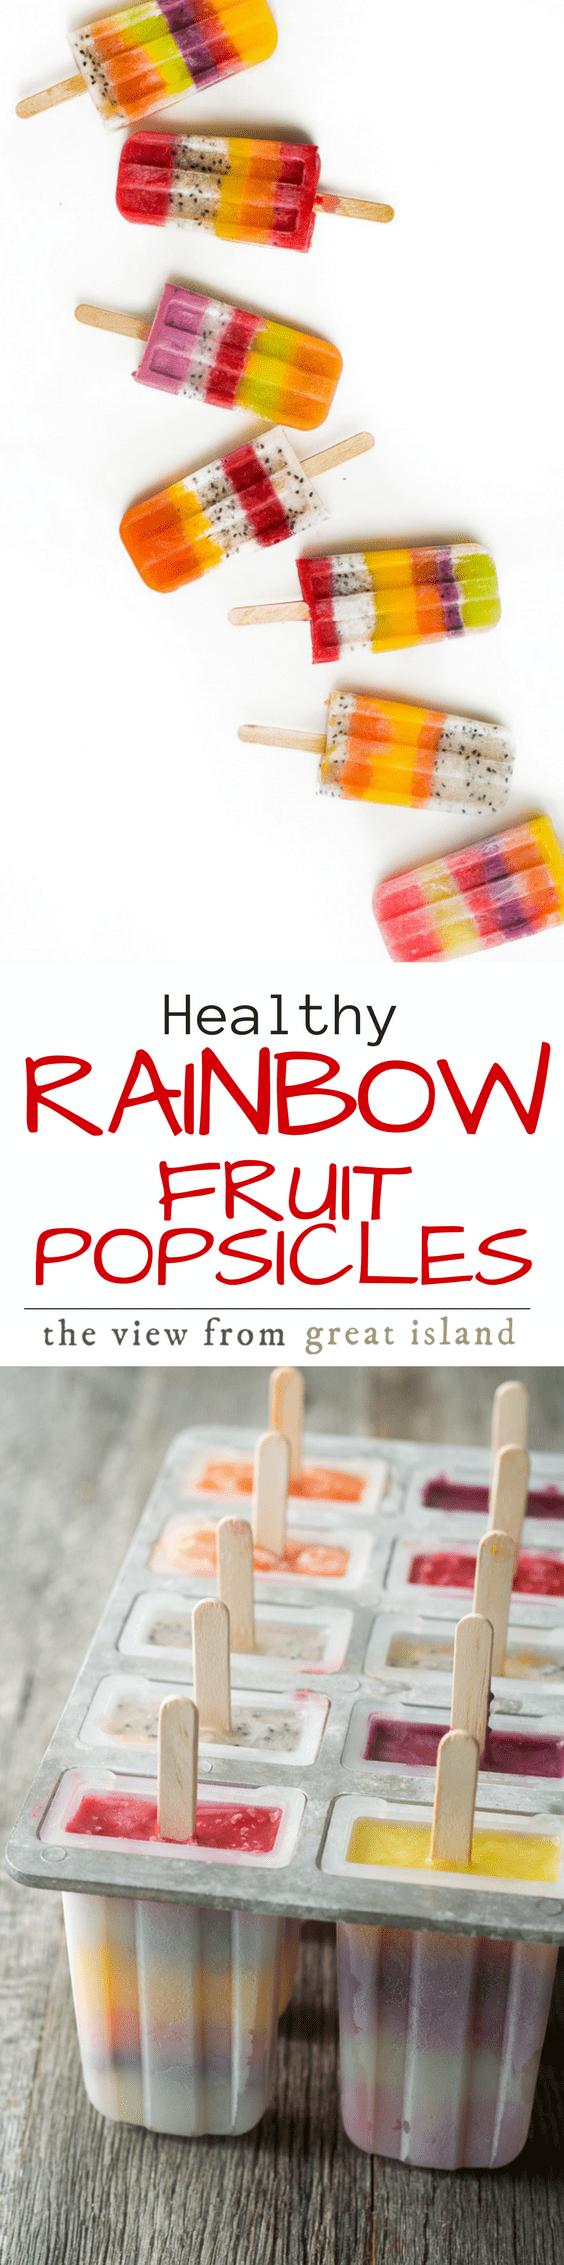 Healthy frozen fruit popsicles are made with exotic fruits like mango, dragon fruit, papaya, golden kiwi and black raspberry. #popsicles #kids #rainbowfruit #fruitpopsicles #nosugarpopsicles #fruitdessert #fruitjuice #fruitpuree